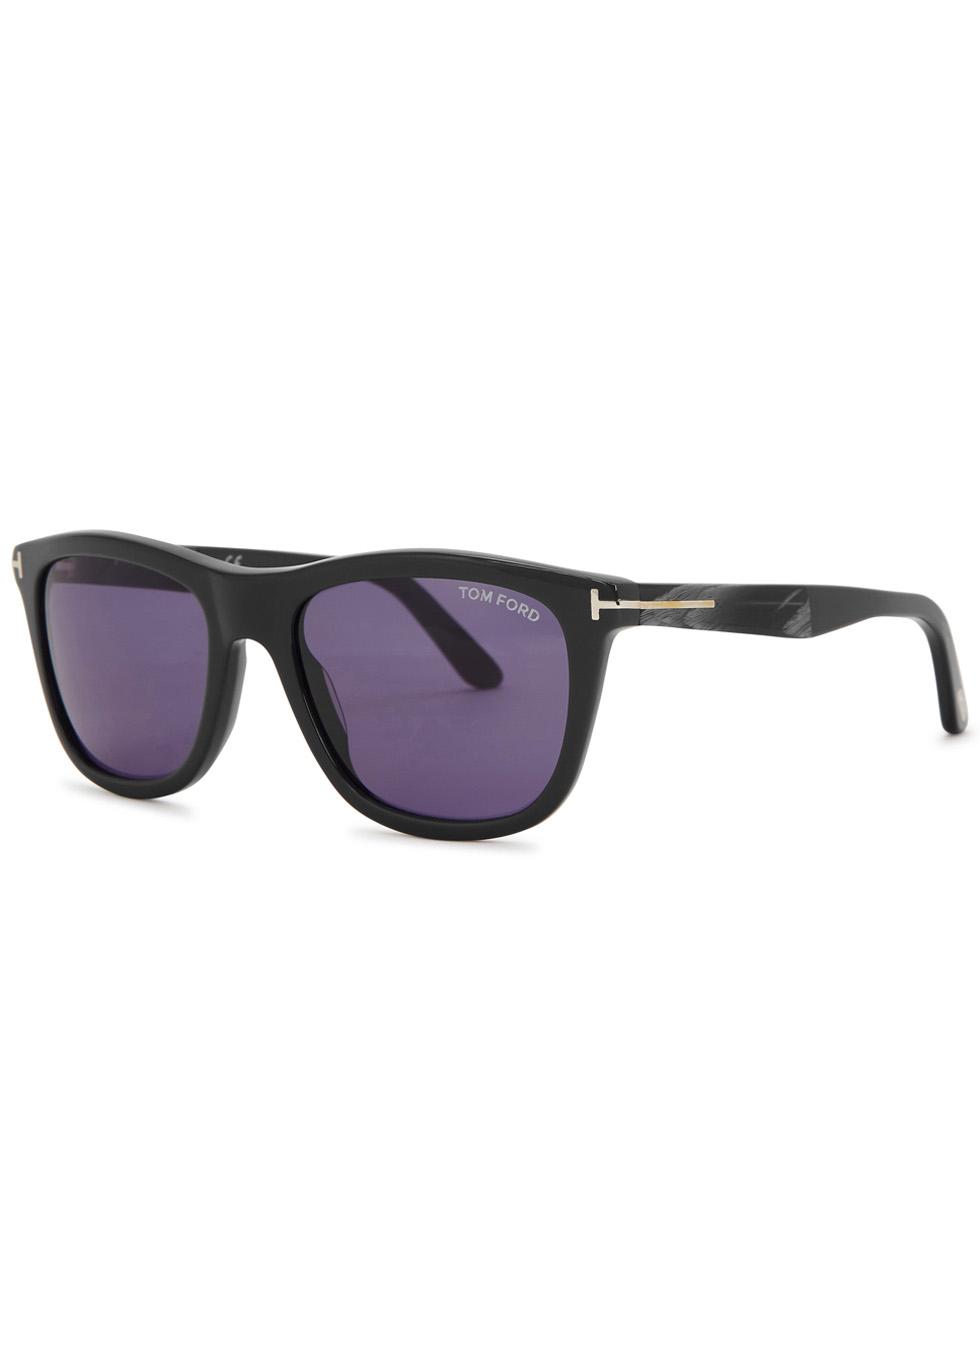 Andrew dark grey wayfarer-style sunglasses - Tom Ford Eyewear